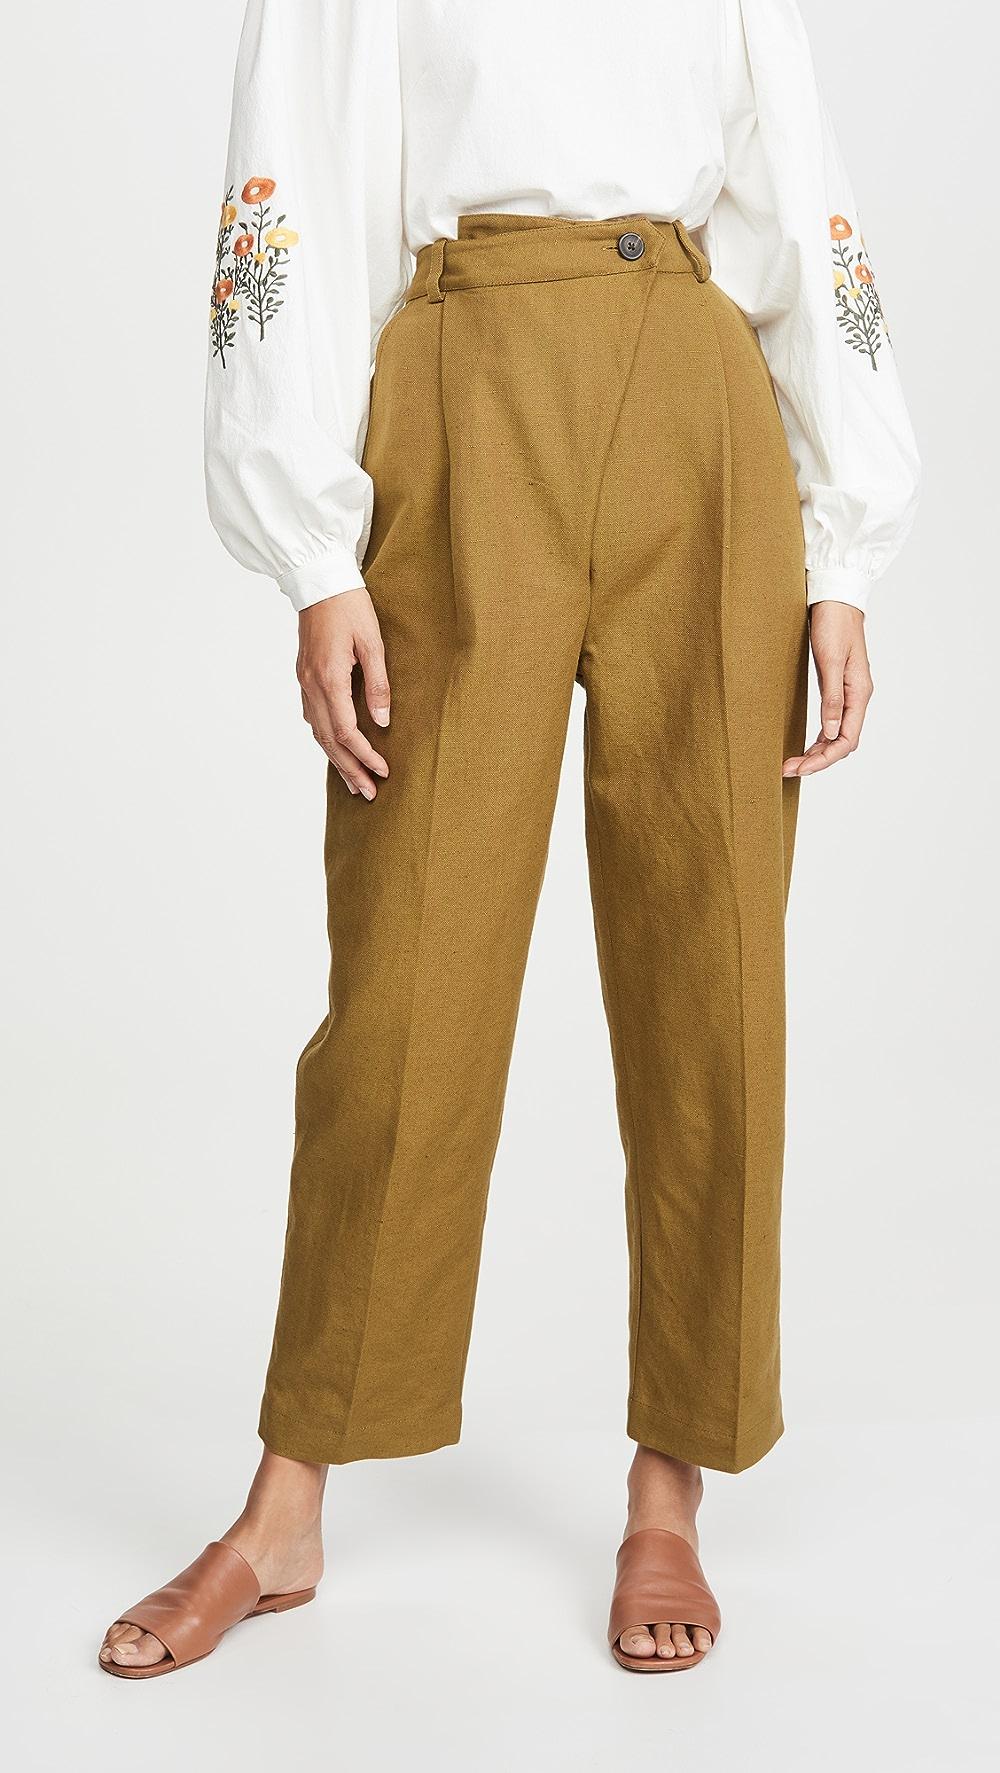 Reliable Mara Hoffman - Almeria Trousers Agreeable To Taste